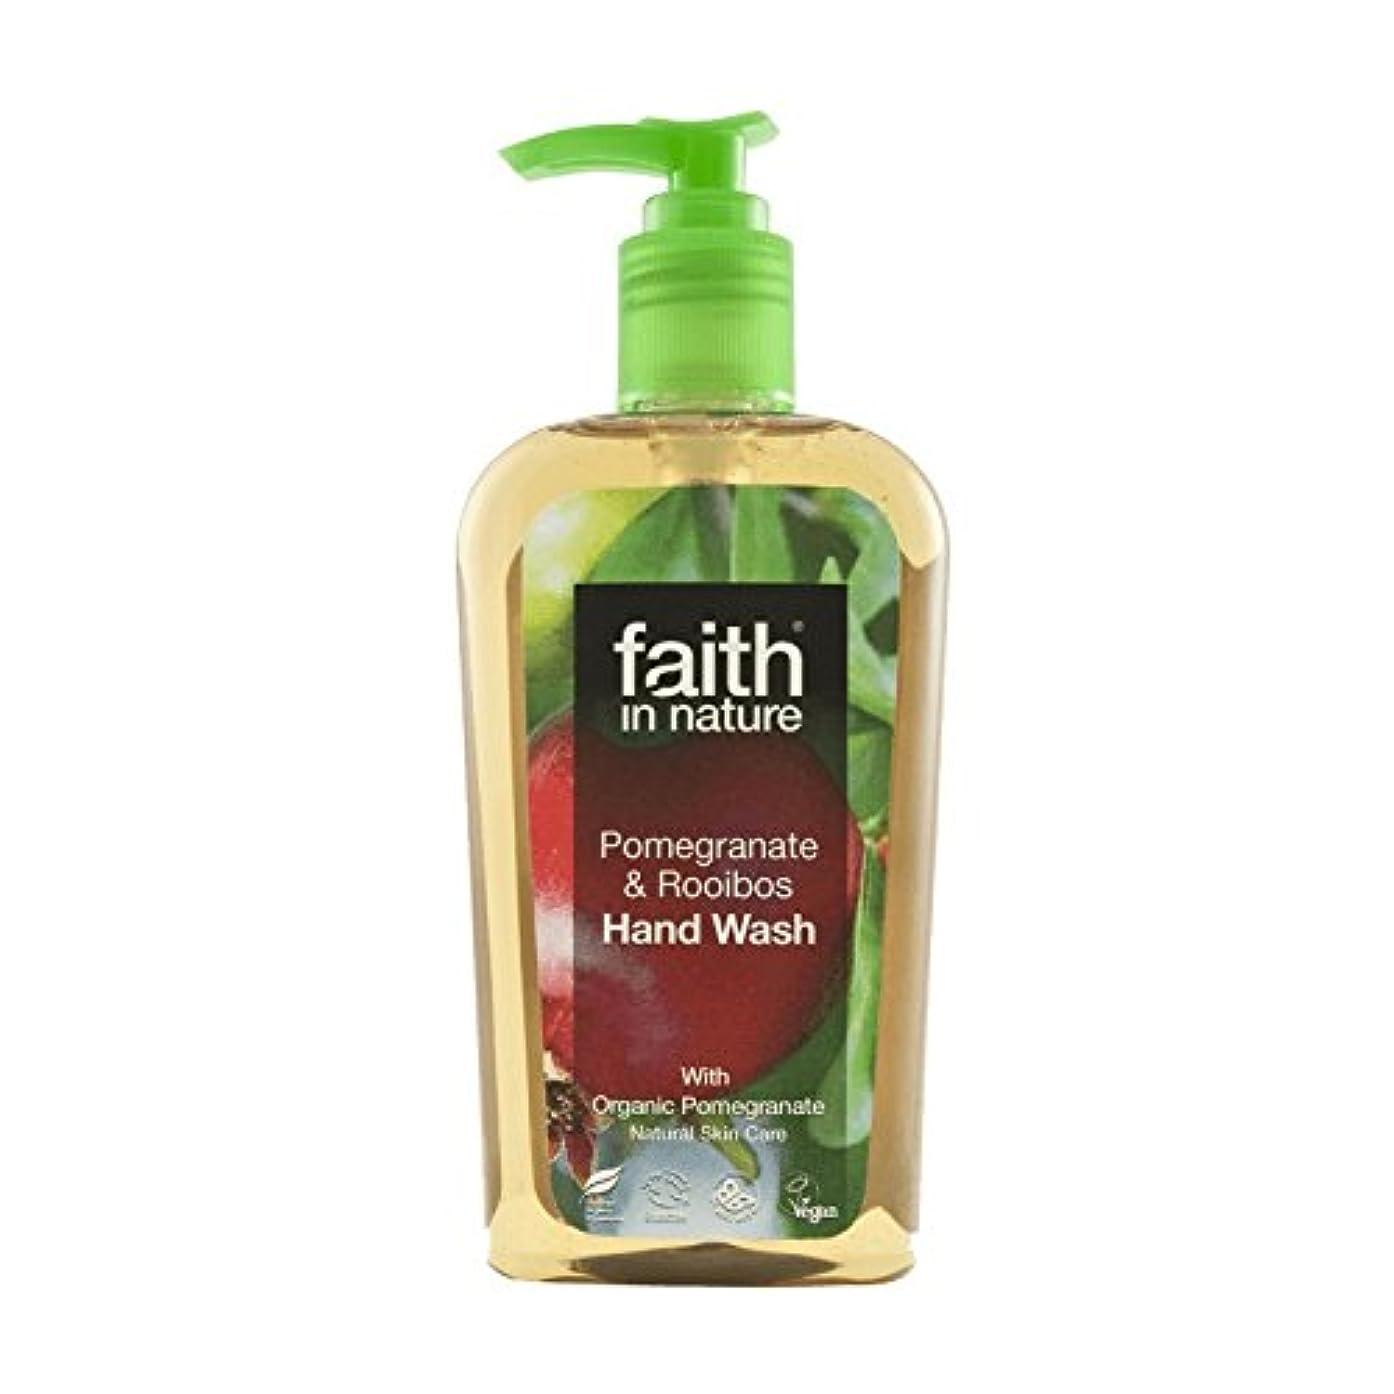 Faith In Nature Pomegranate & Rooibos Handwash 300ml (Pack of 2) - 自然ザクロ&ルイボス手洗いの300ミリリットルの信仰 (x2) [並行輸入品]